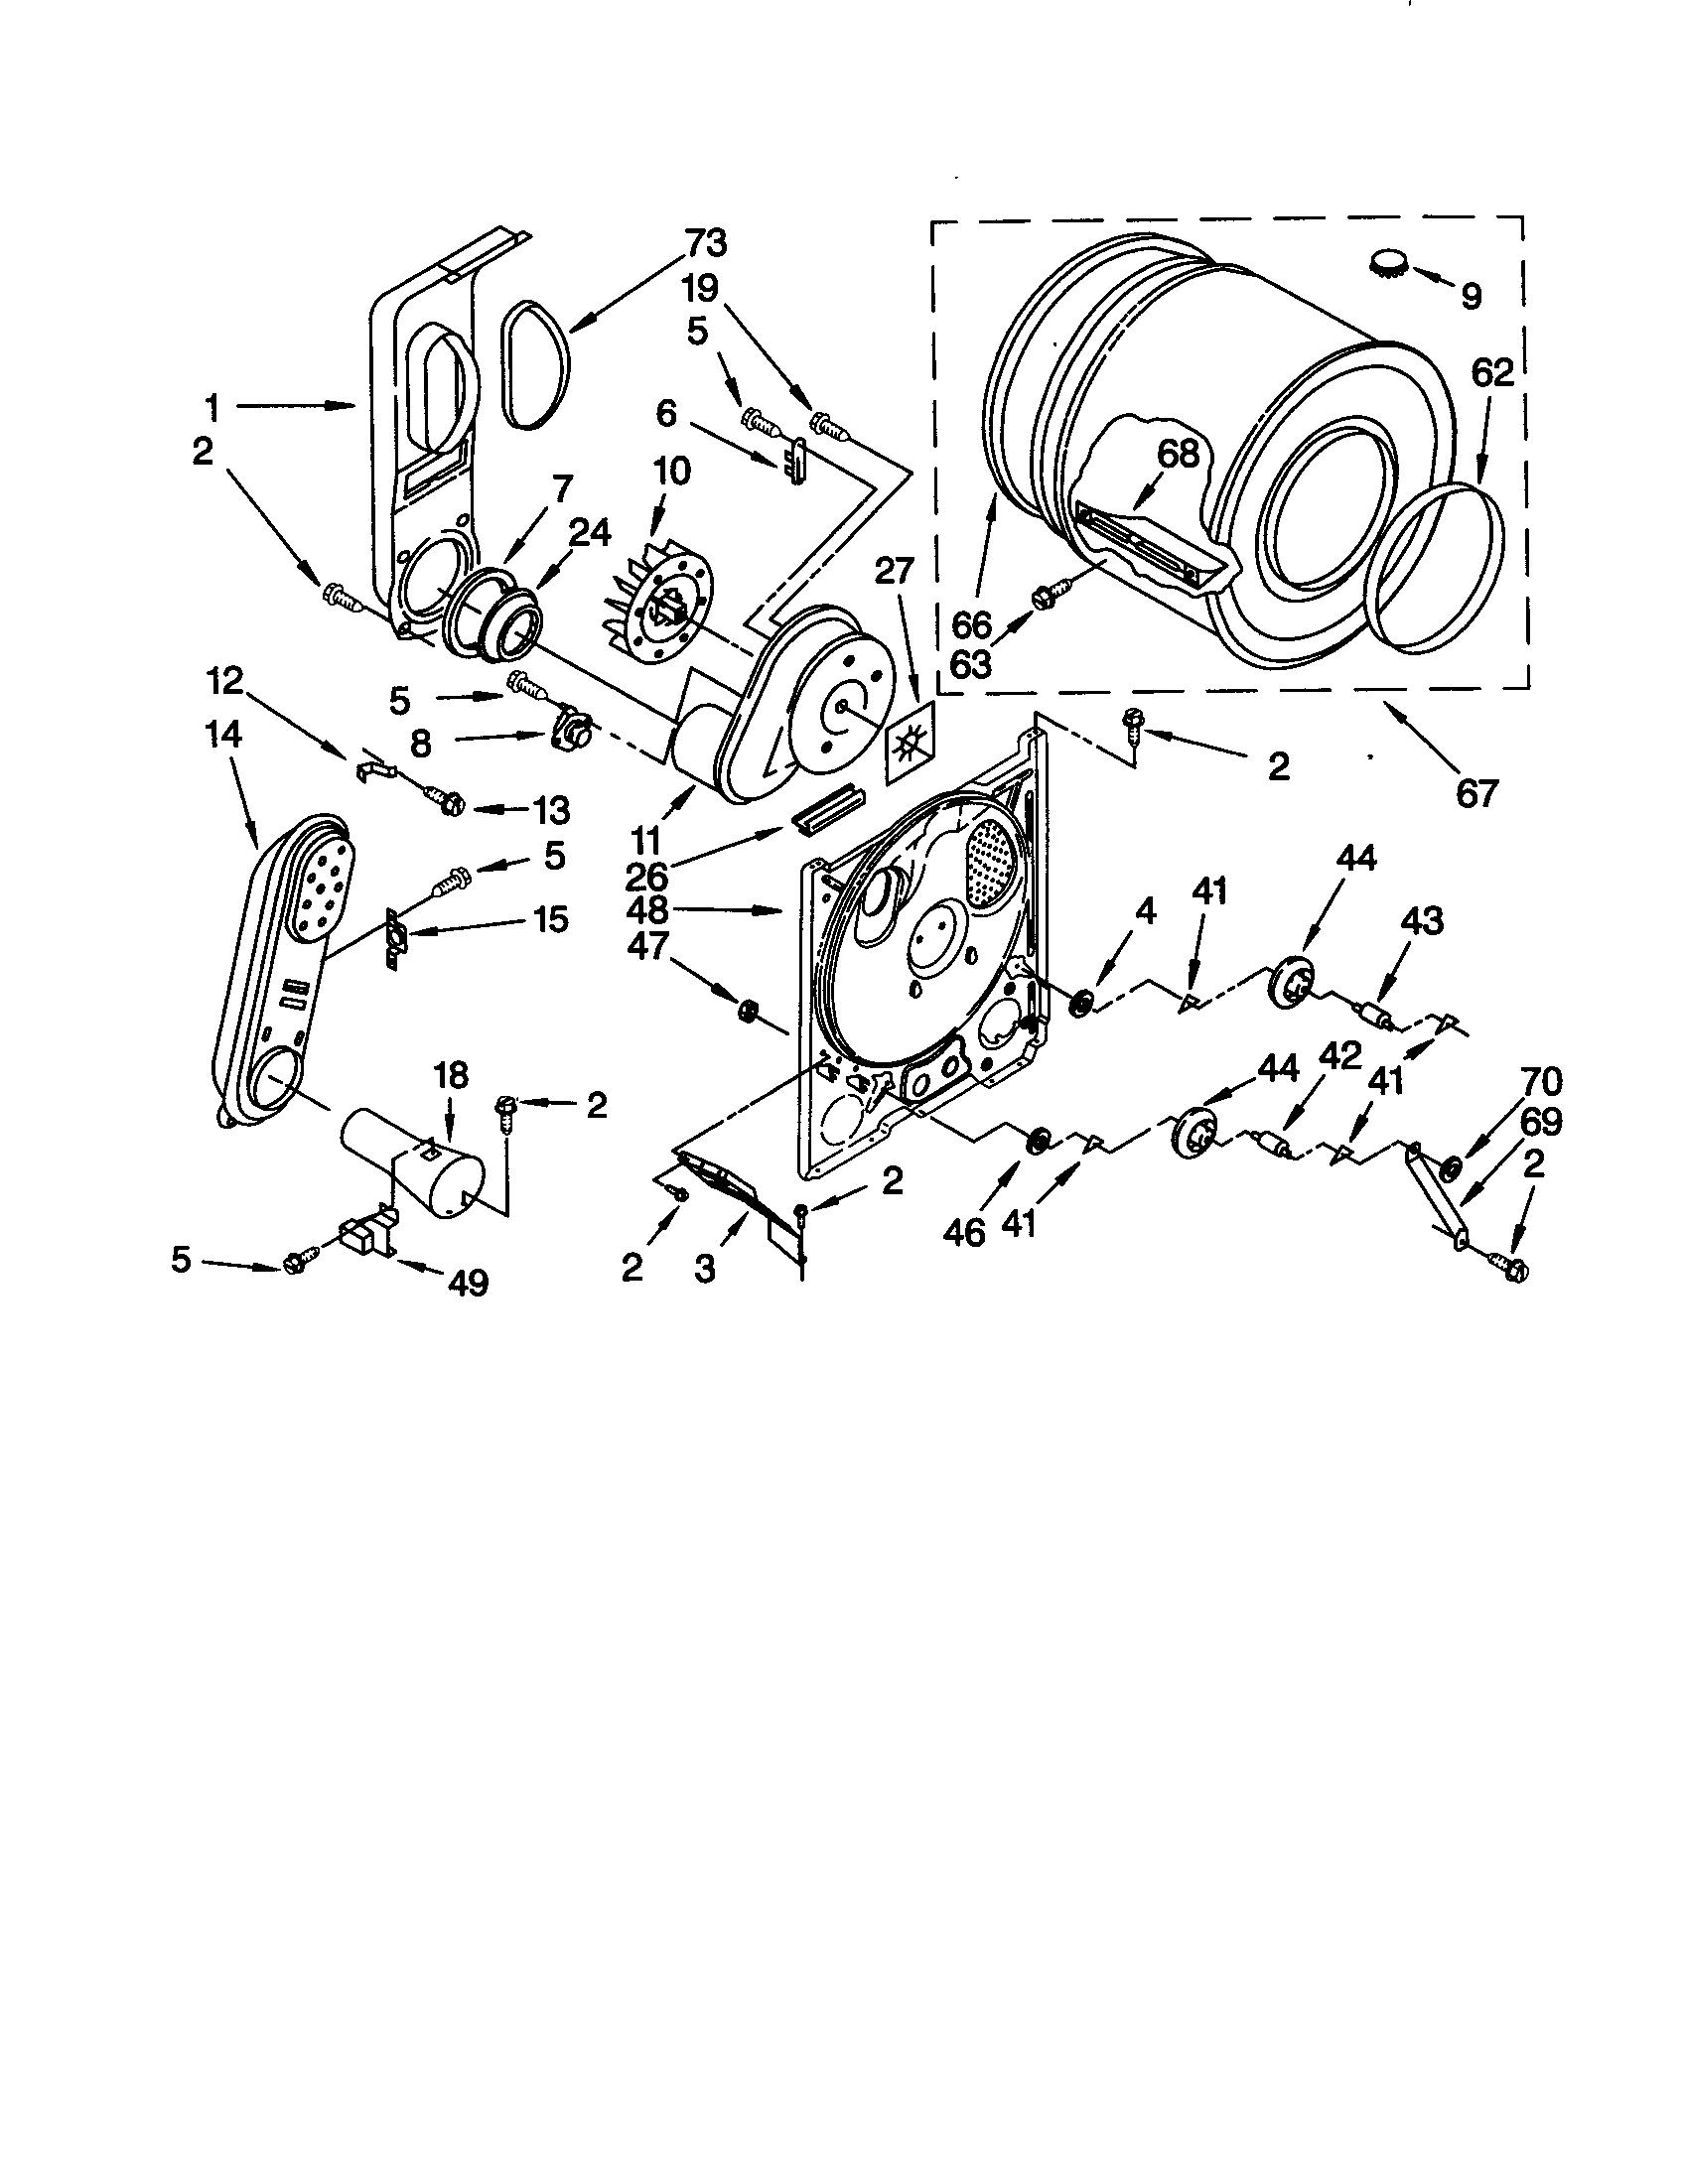 wachovia wiring instructions